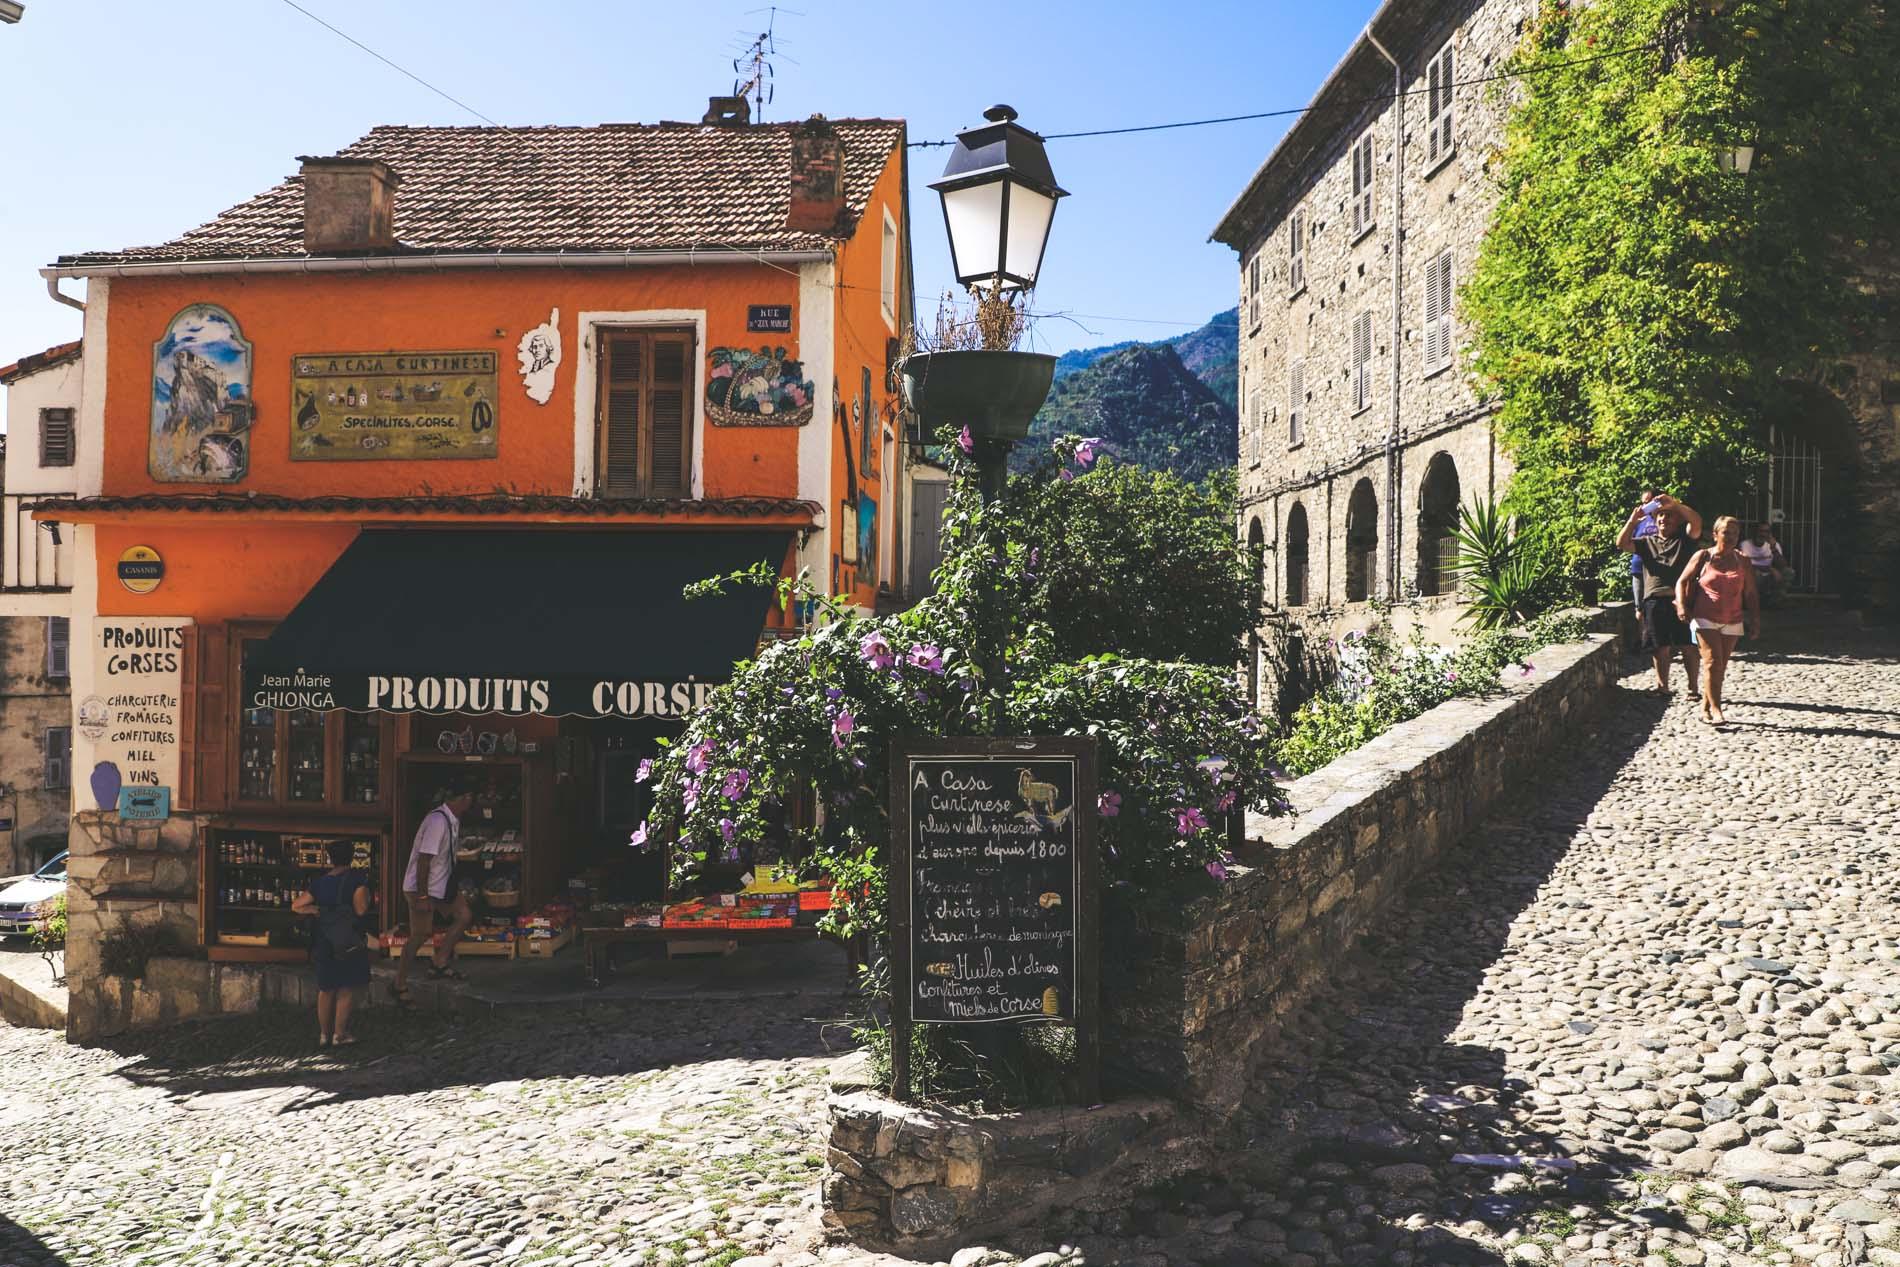 Epicerie Corse